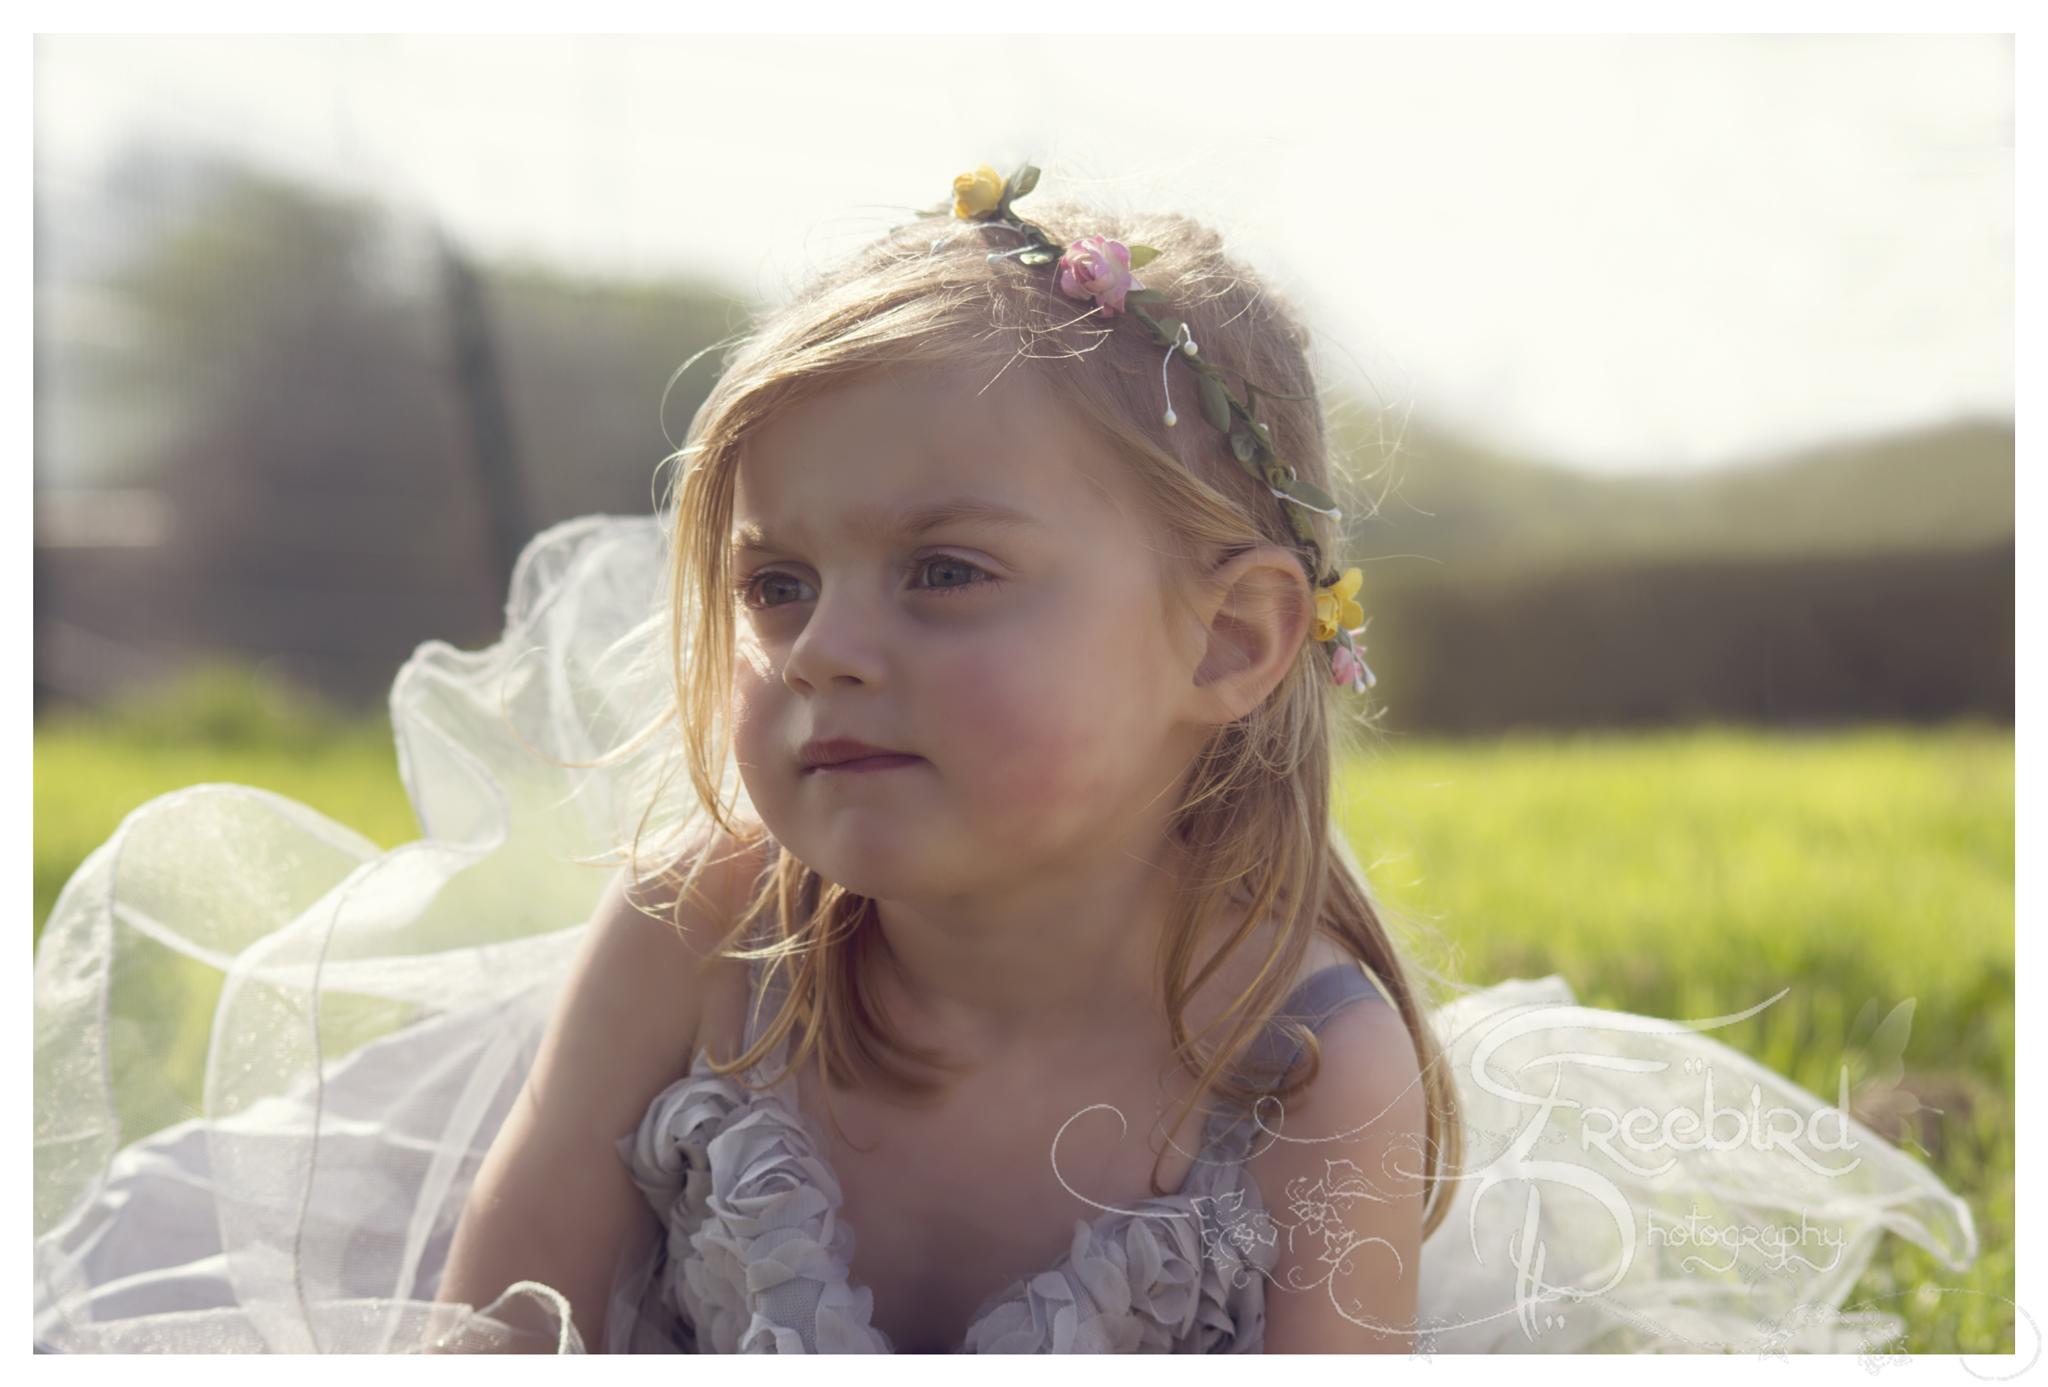 Dreamy Princess by FreebirdphotographyUK